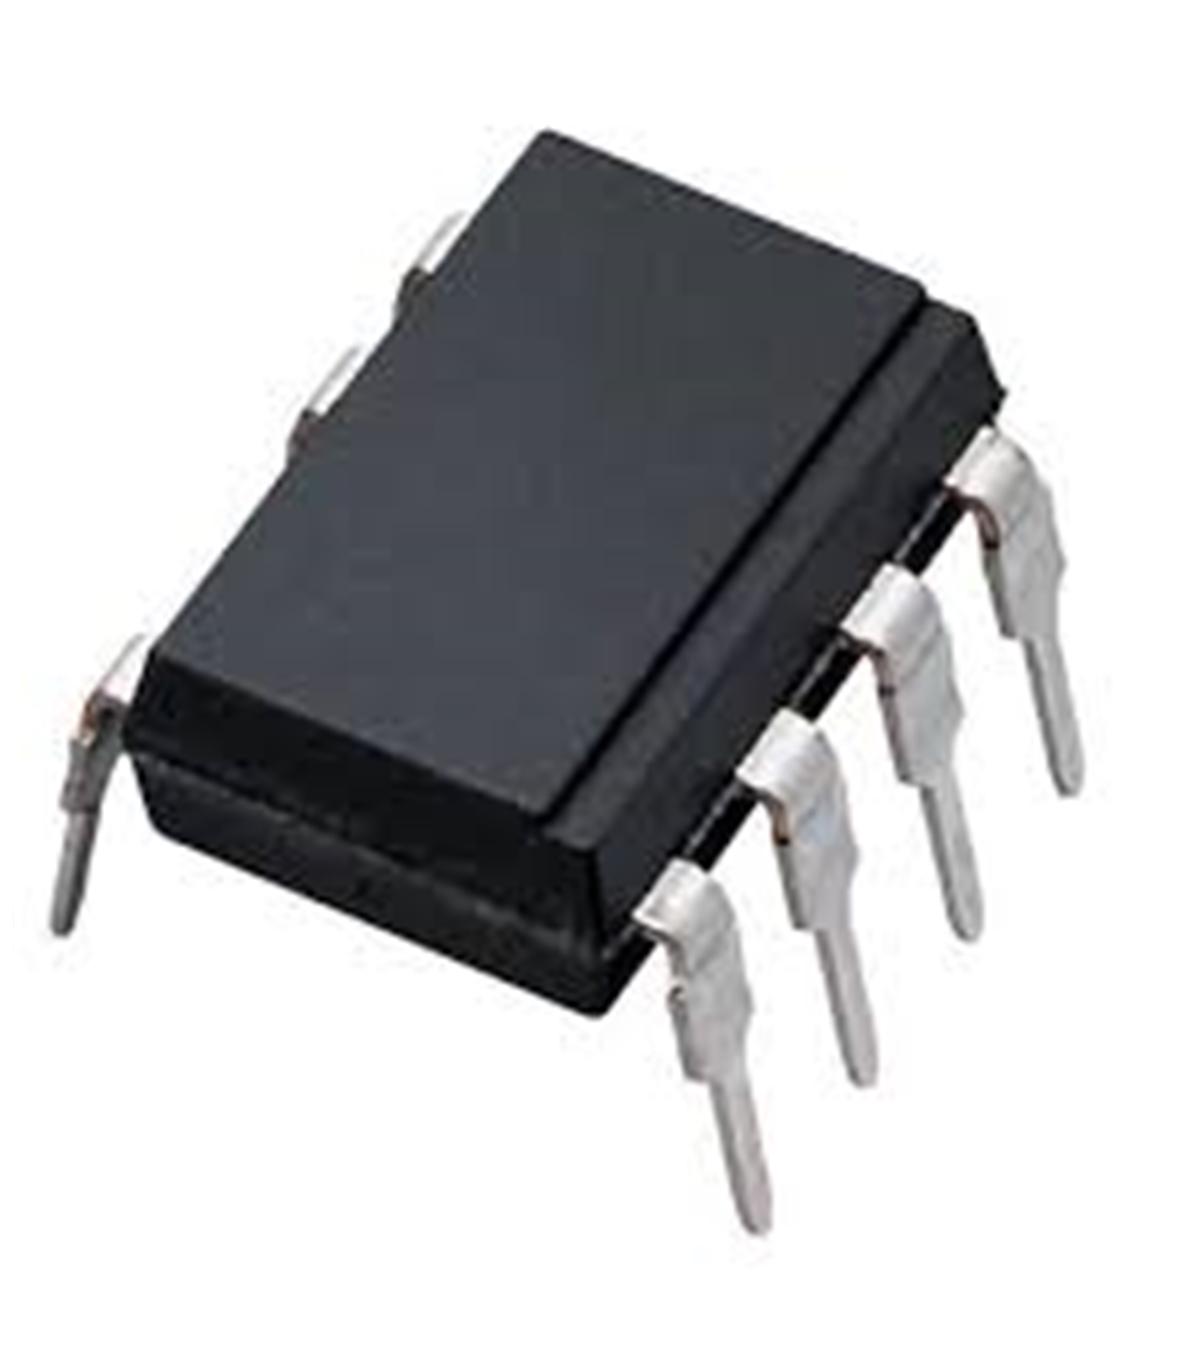 Ca3140e Ic Op Amp Mos Ip Bipolar 3140 Electronica Currentamplifierca3140